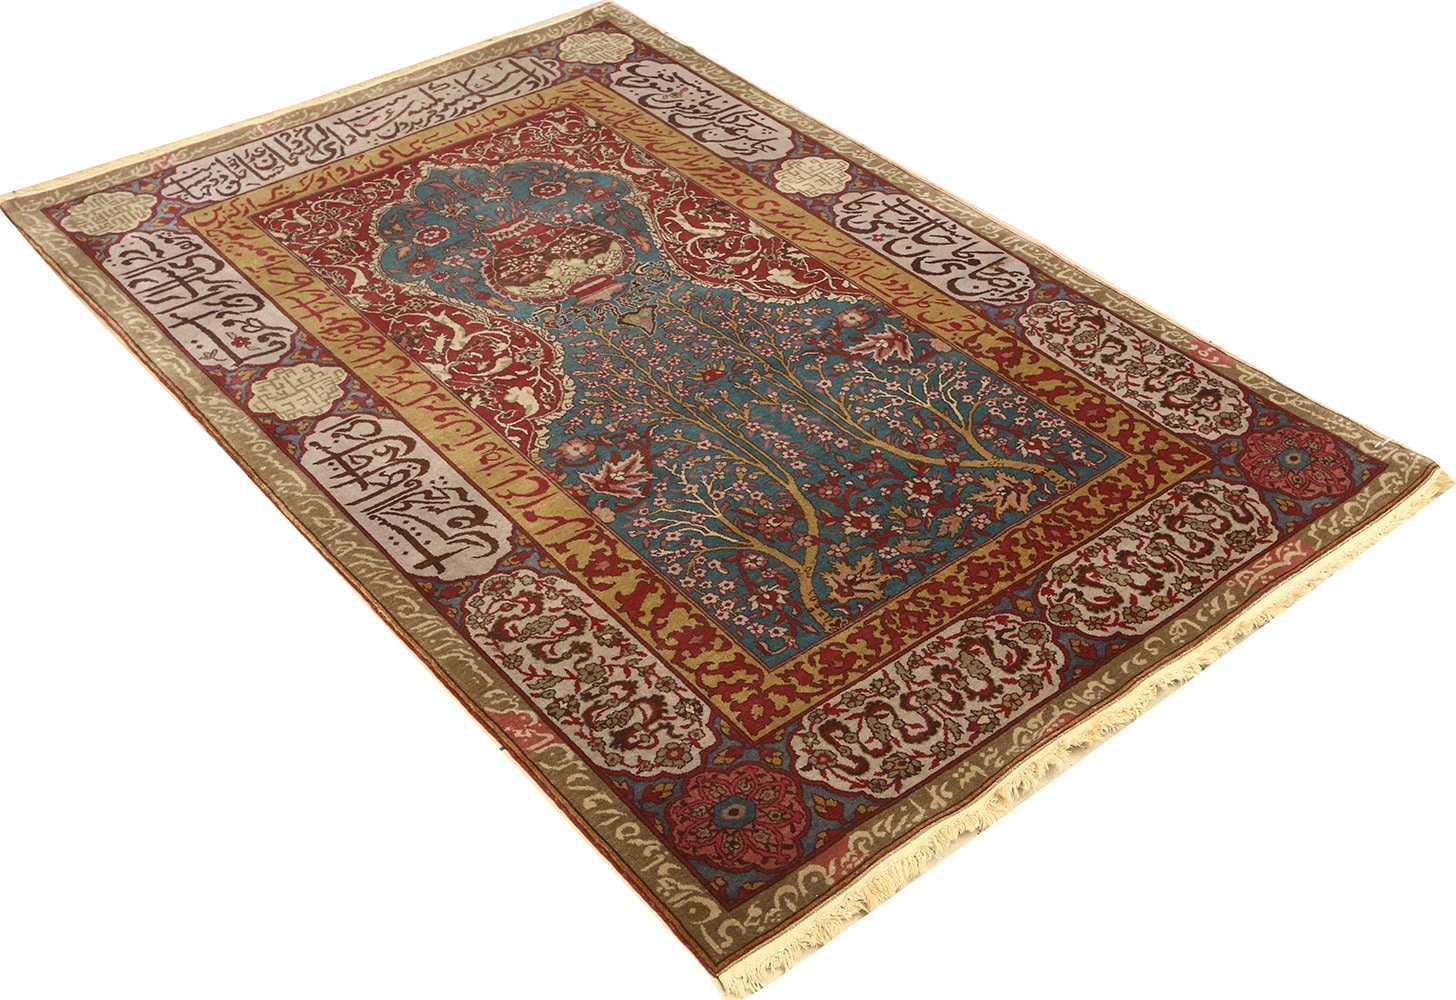 antique prayer design agra indian rug 51175 side Nazmiyal